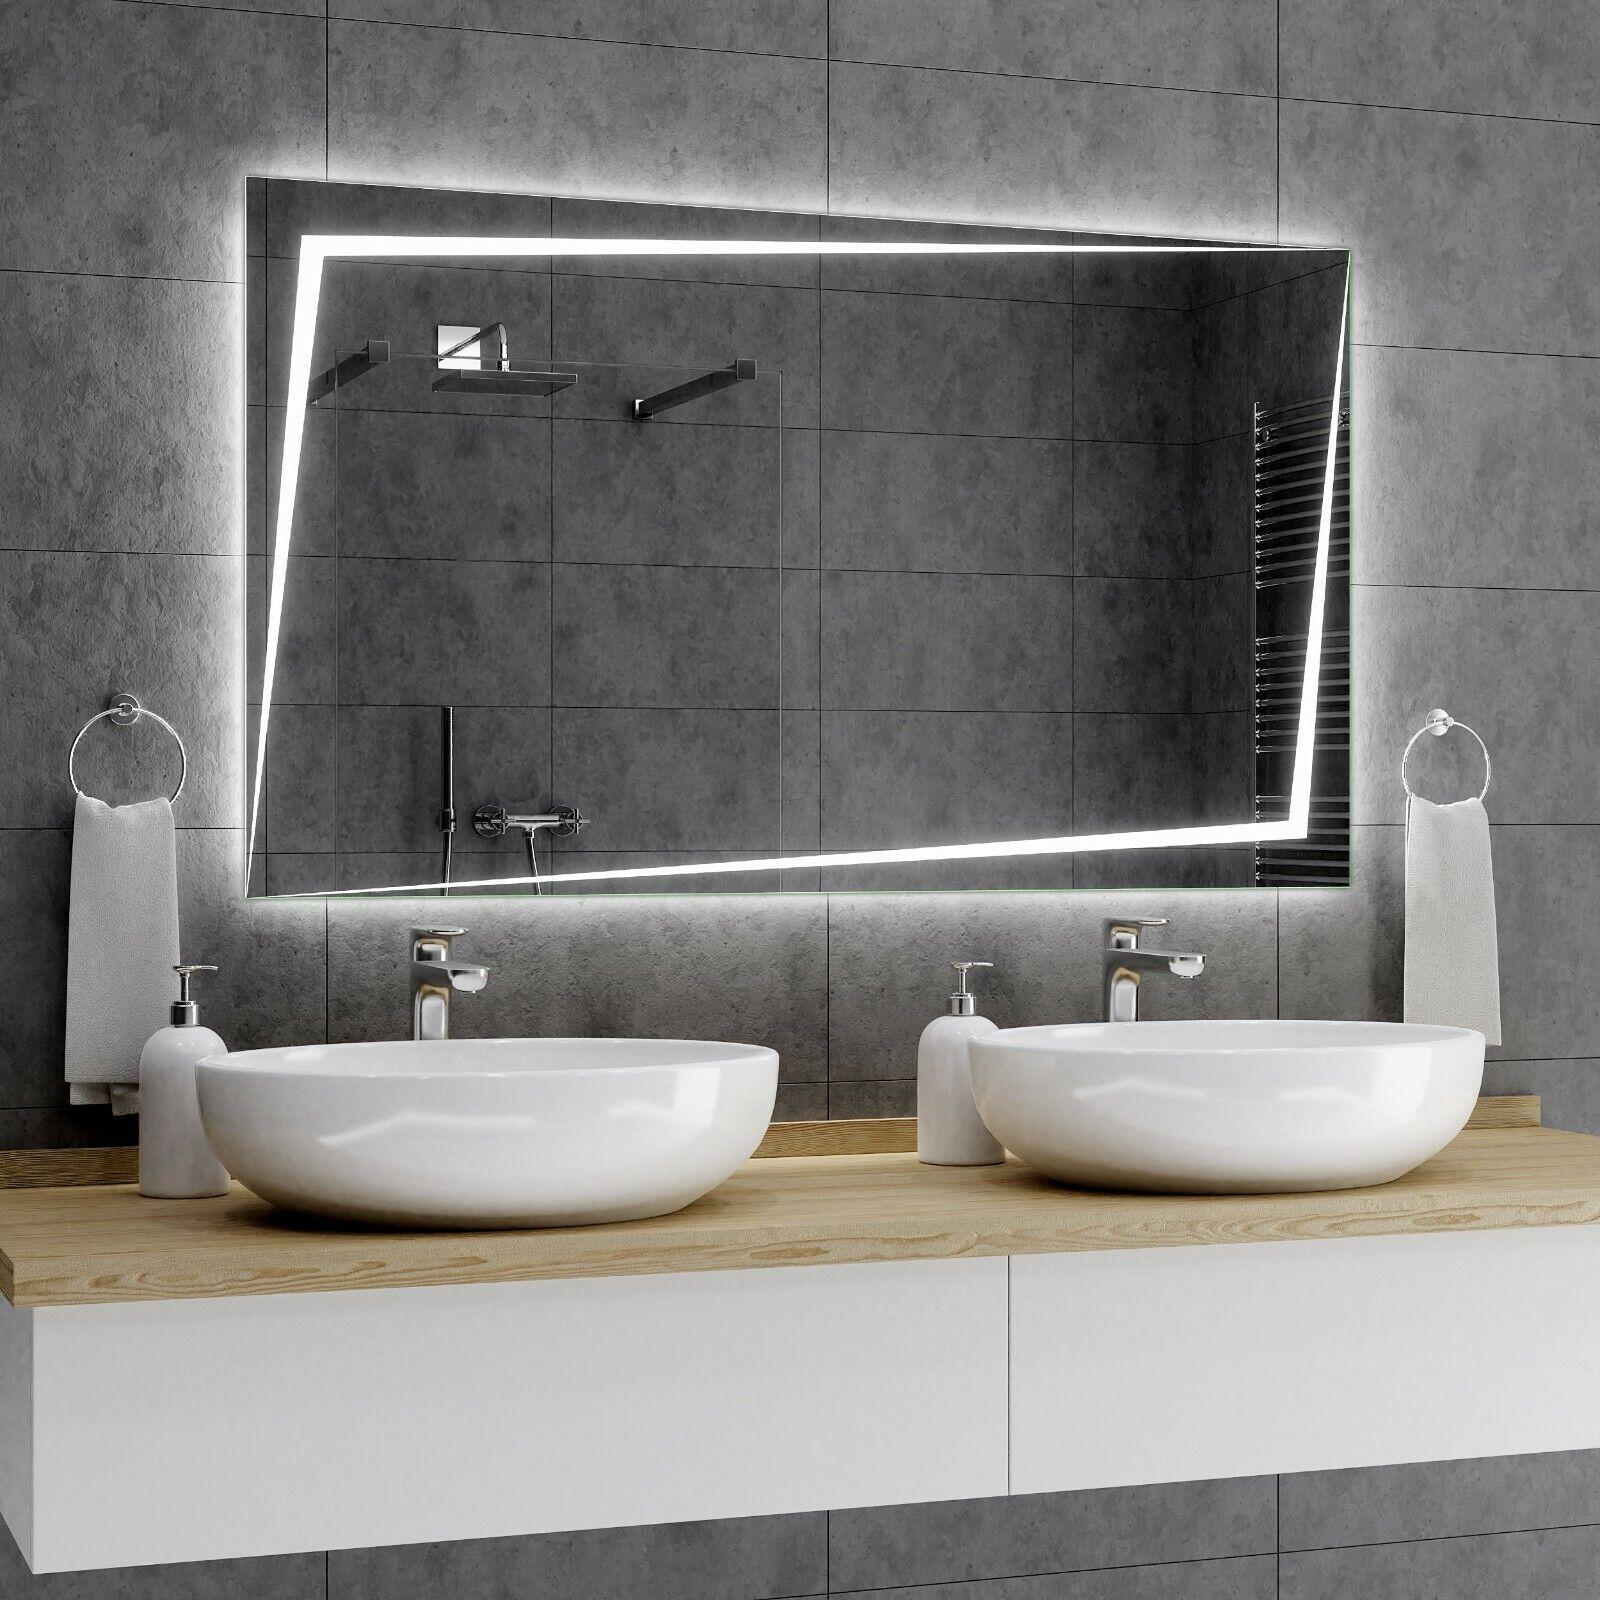 BERLIN Badspiegel mit LED Beleuchtung Wandspiegel Badezimmerspiegel nach Maß A01